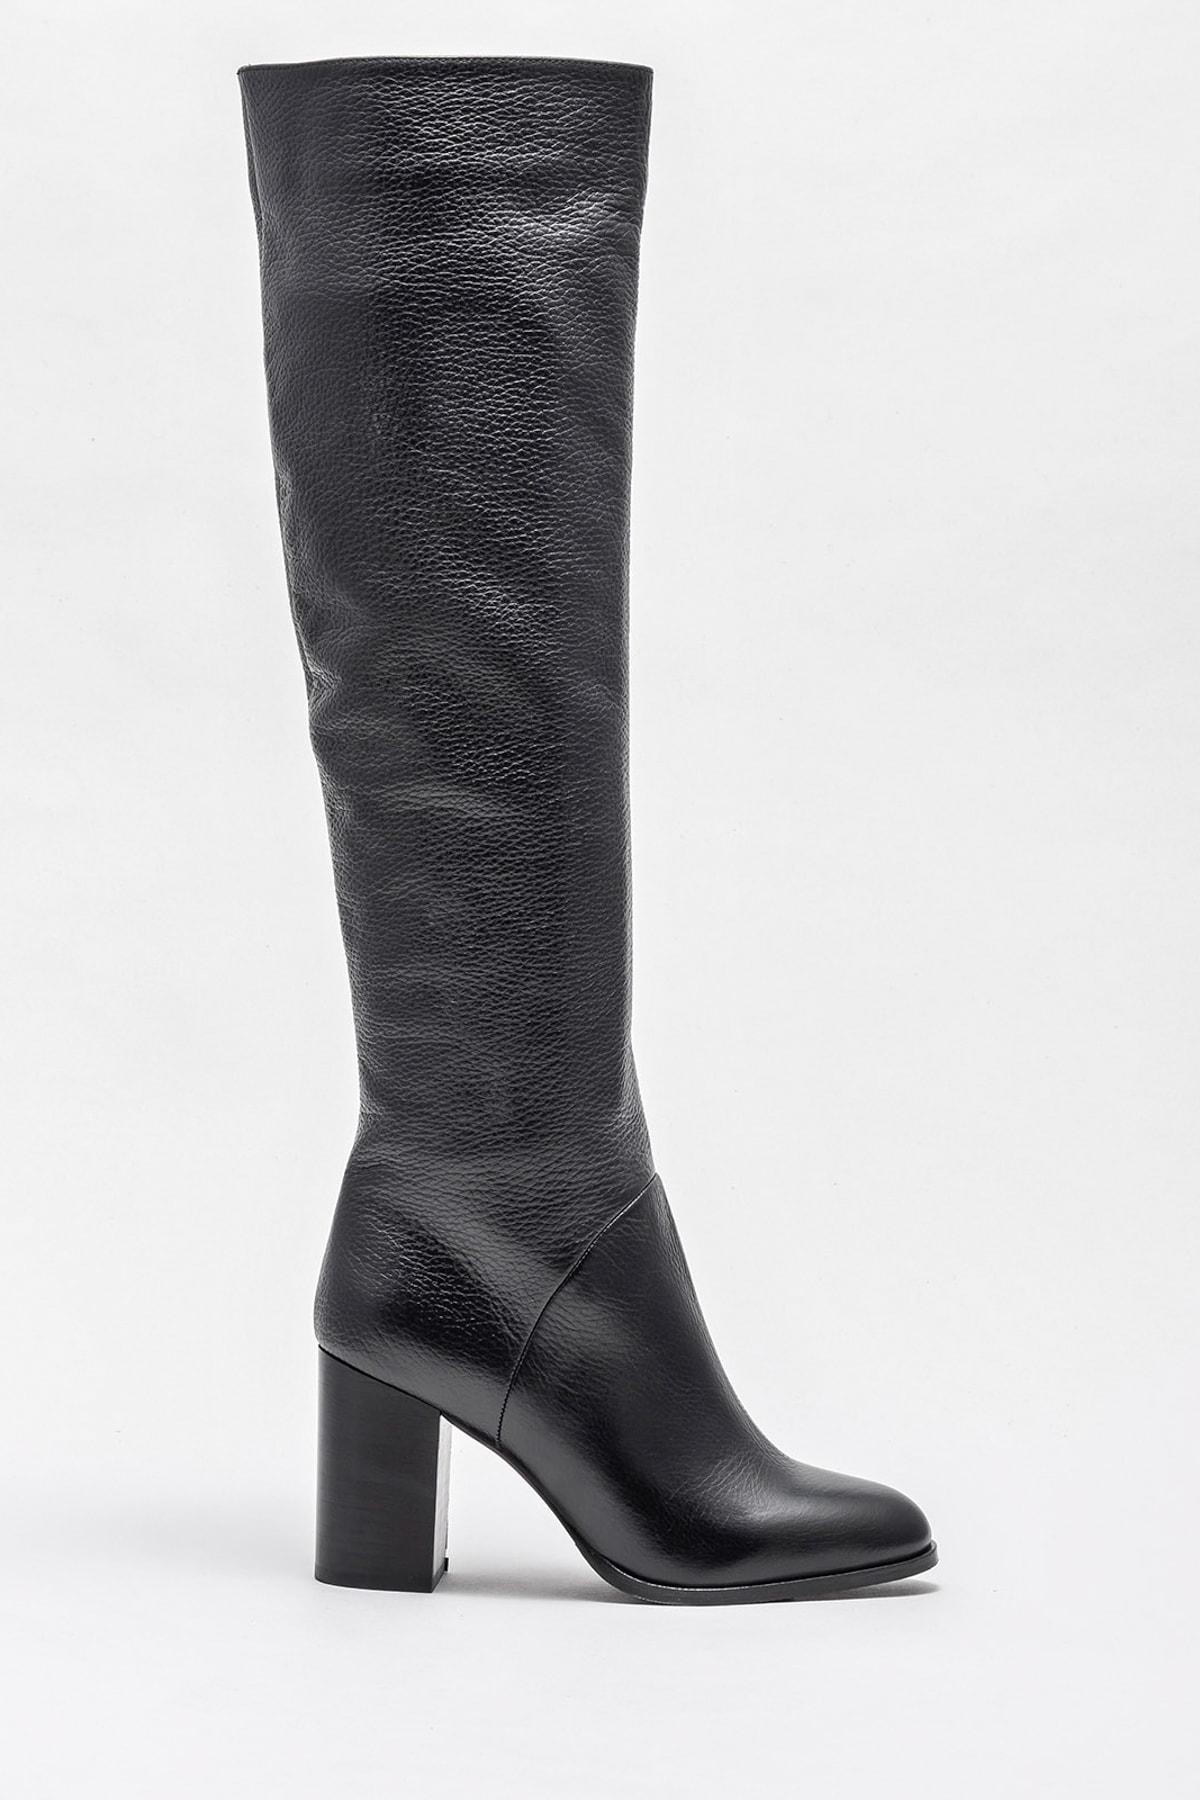 Elle Shoes Kadın RANSEYS Çizme 20KTO18412 2